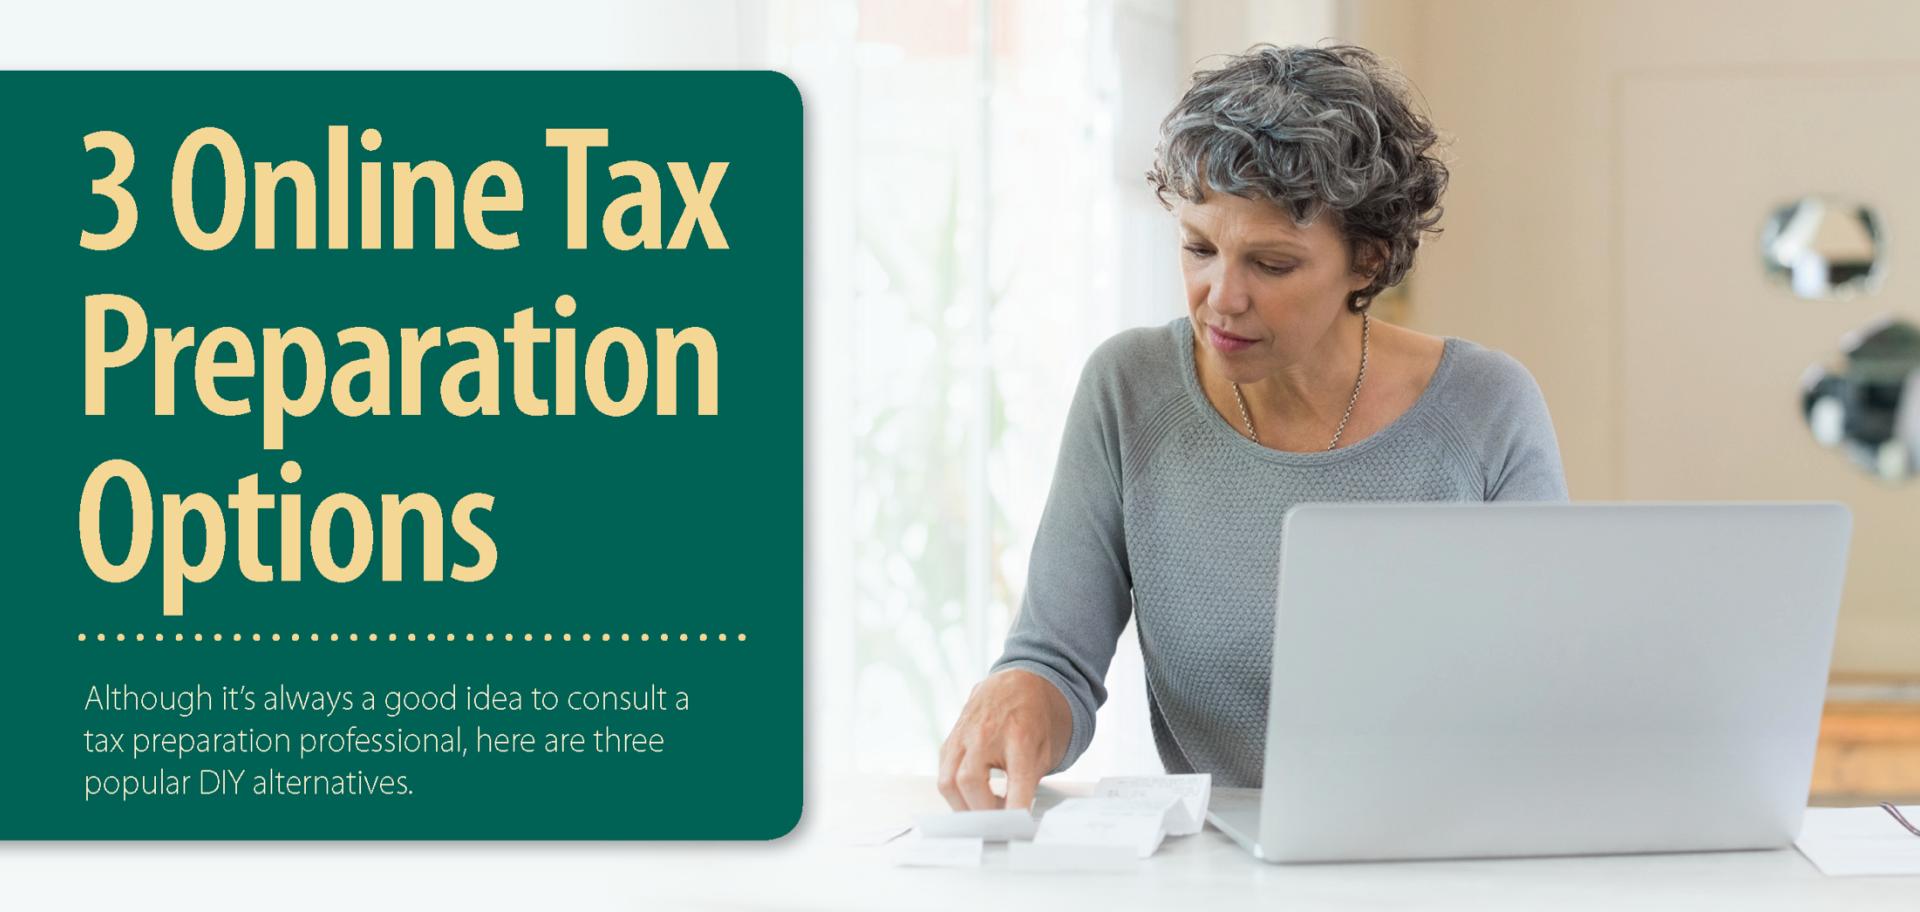 3 Online Tax Preparation Options